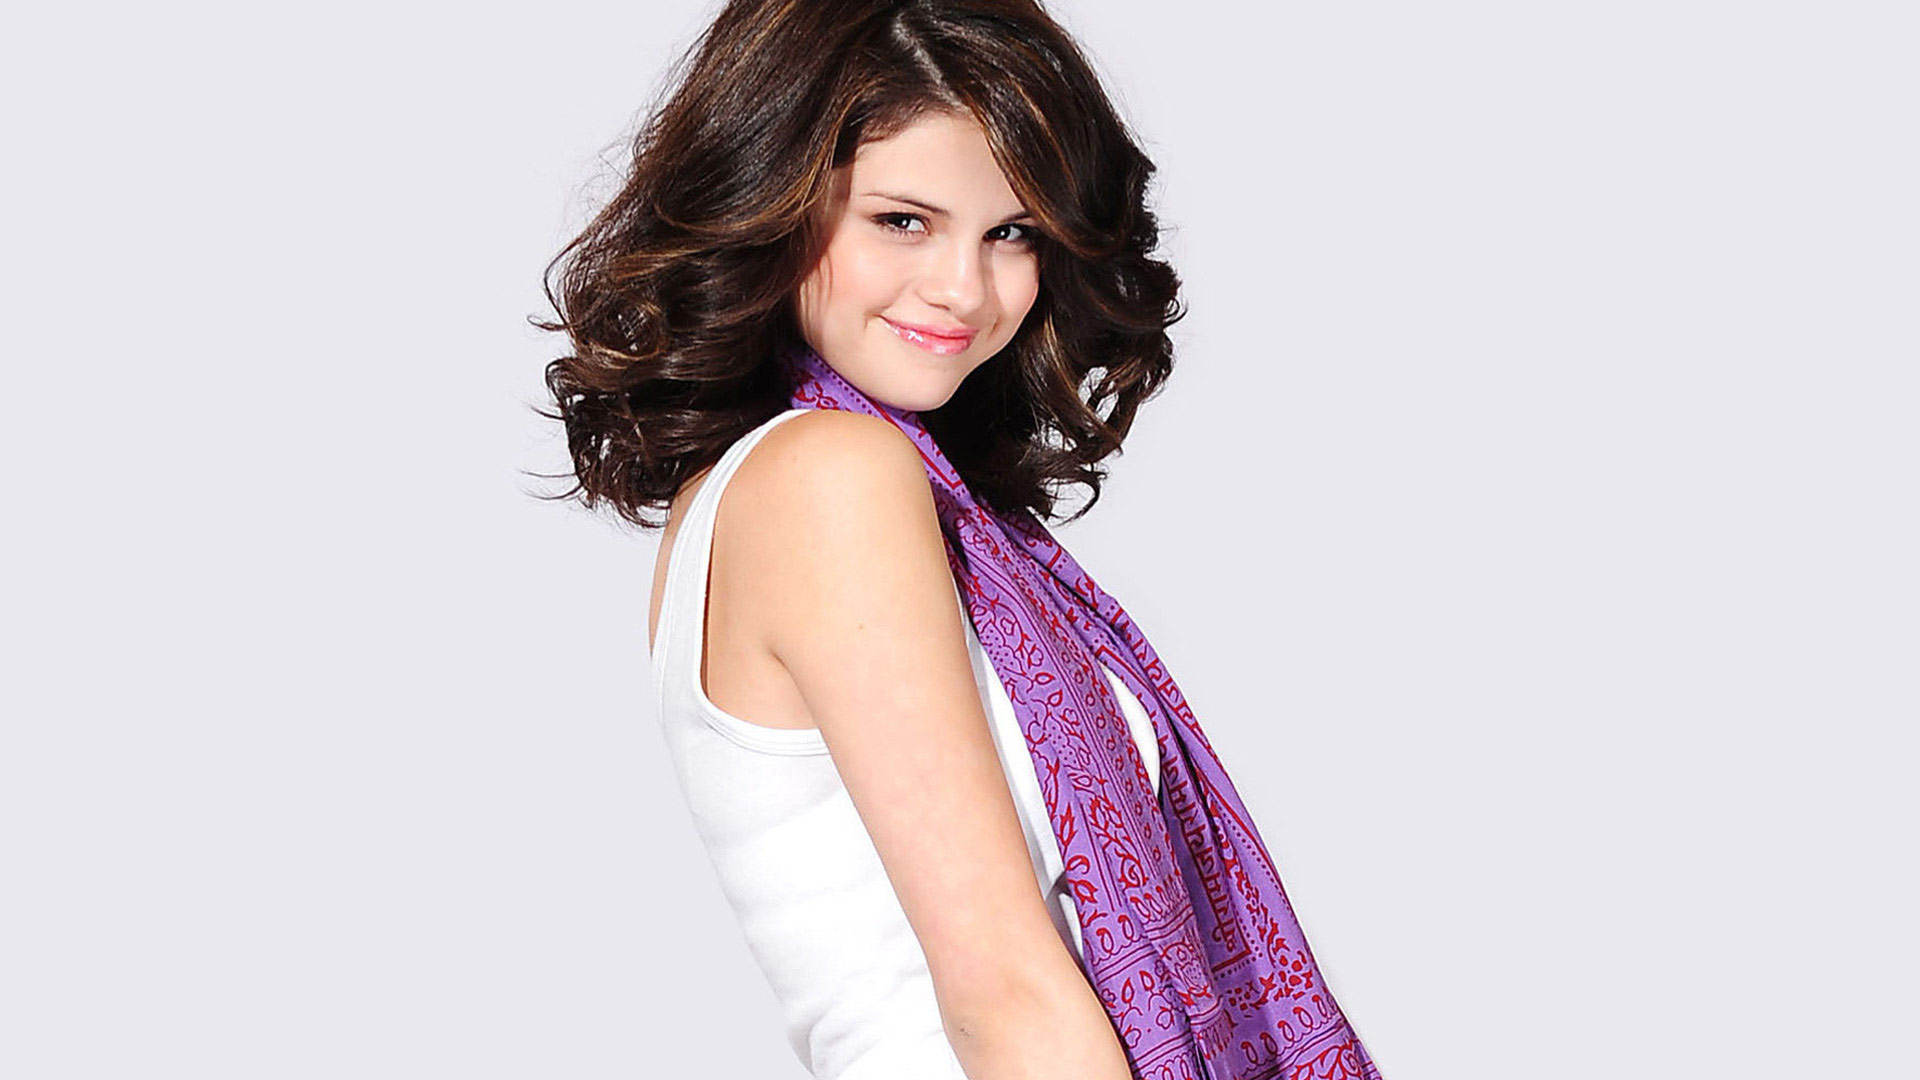 Selena wall